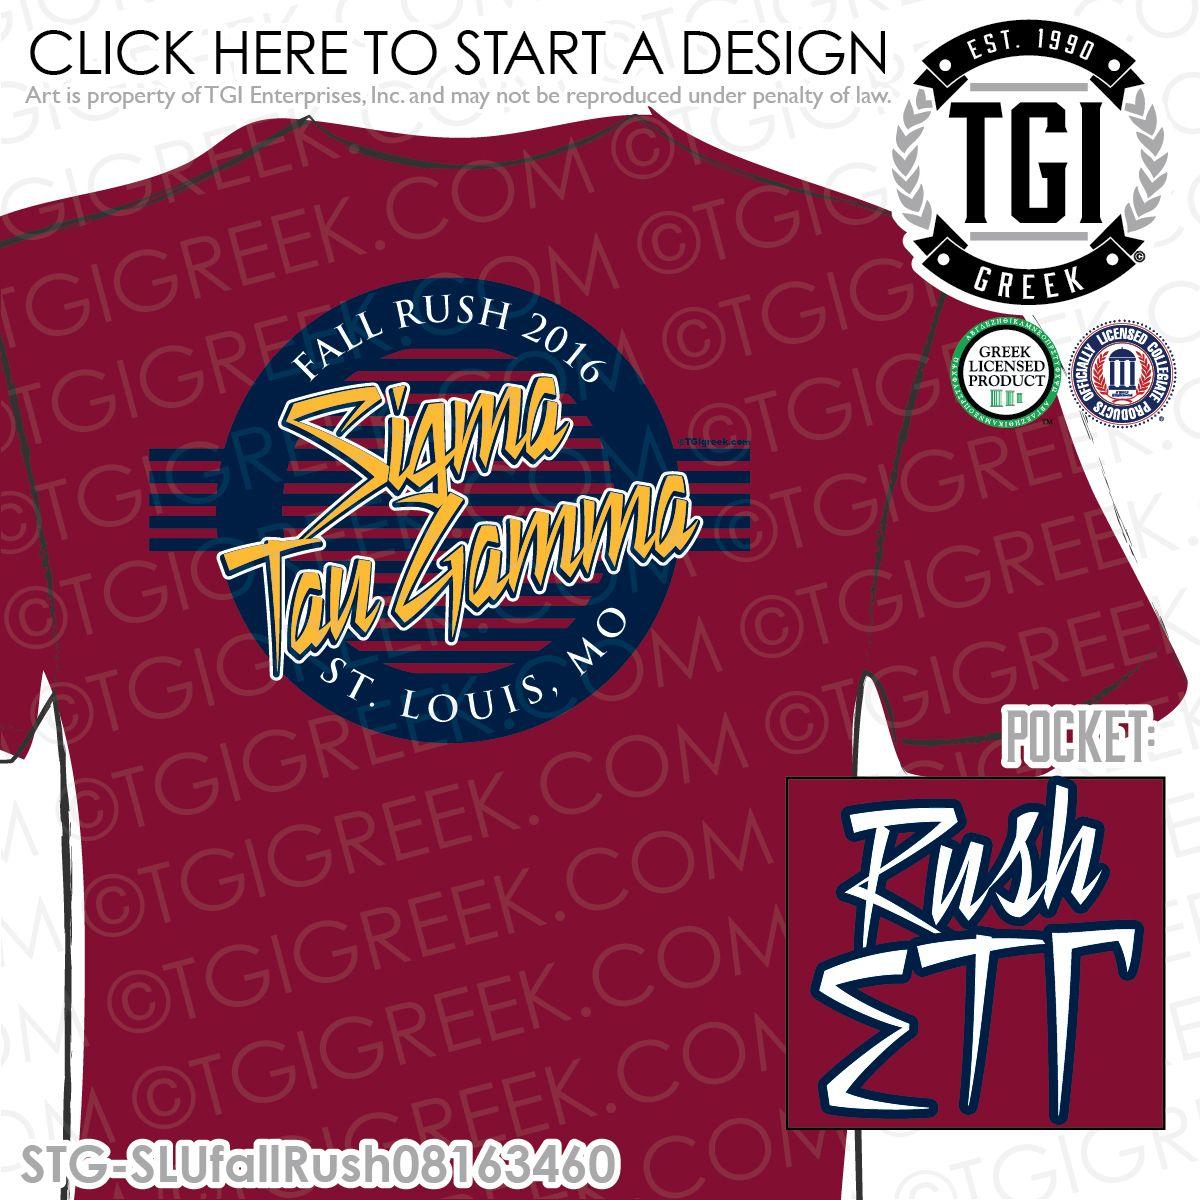 Tgi Greek Sigma Tau Gamma Rush Recruitment Greek Apparel Fraternity T Shirts Sigmataugamma Fra Fraternity Rush Shirts Rush Shirts Fraternity Shirts